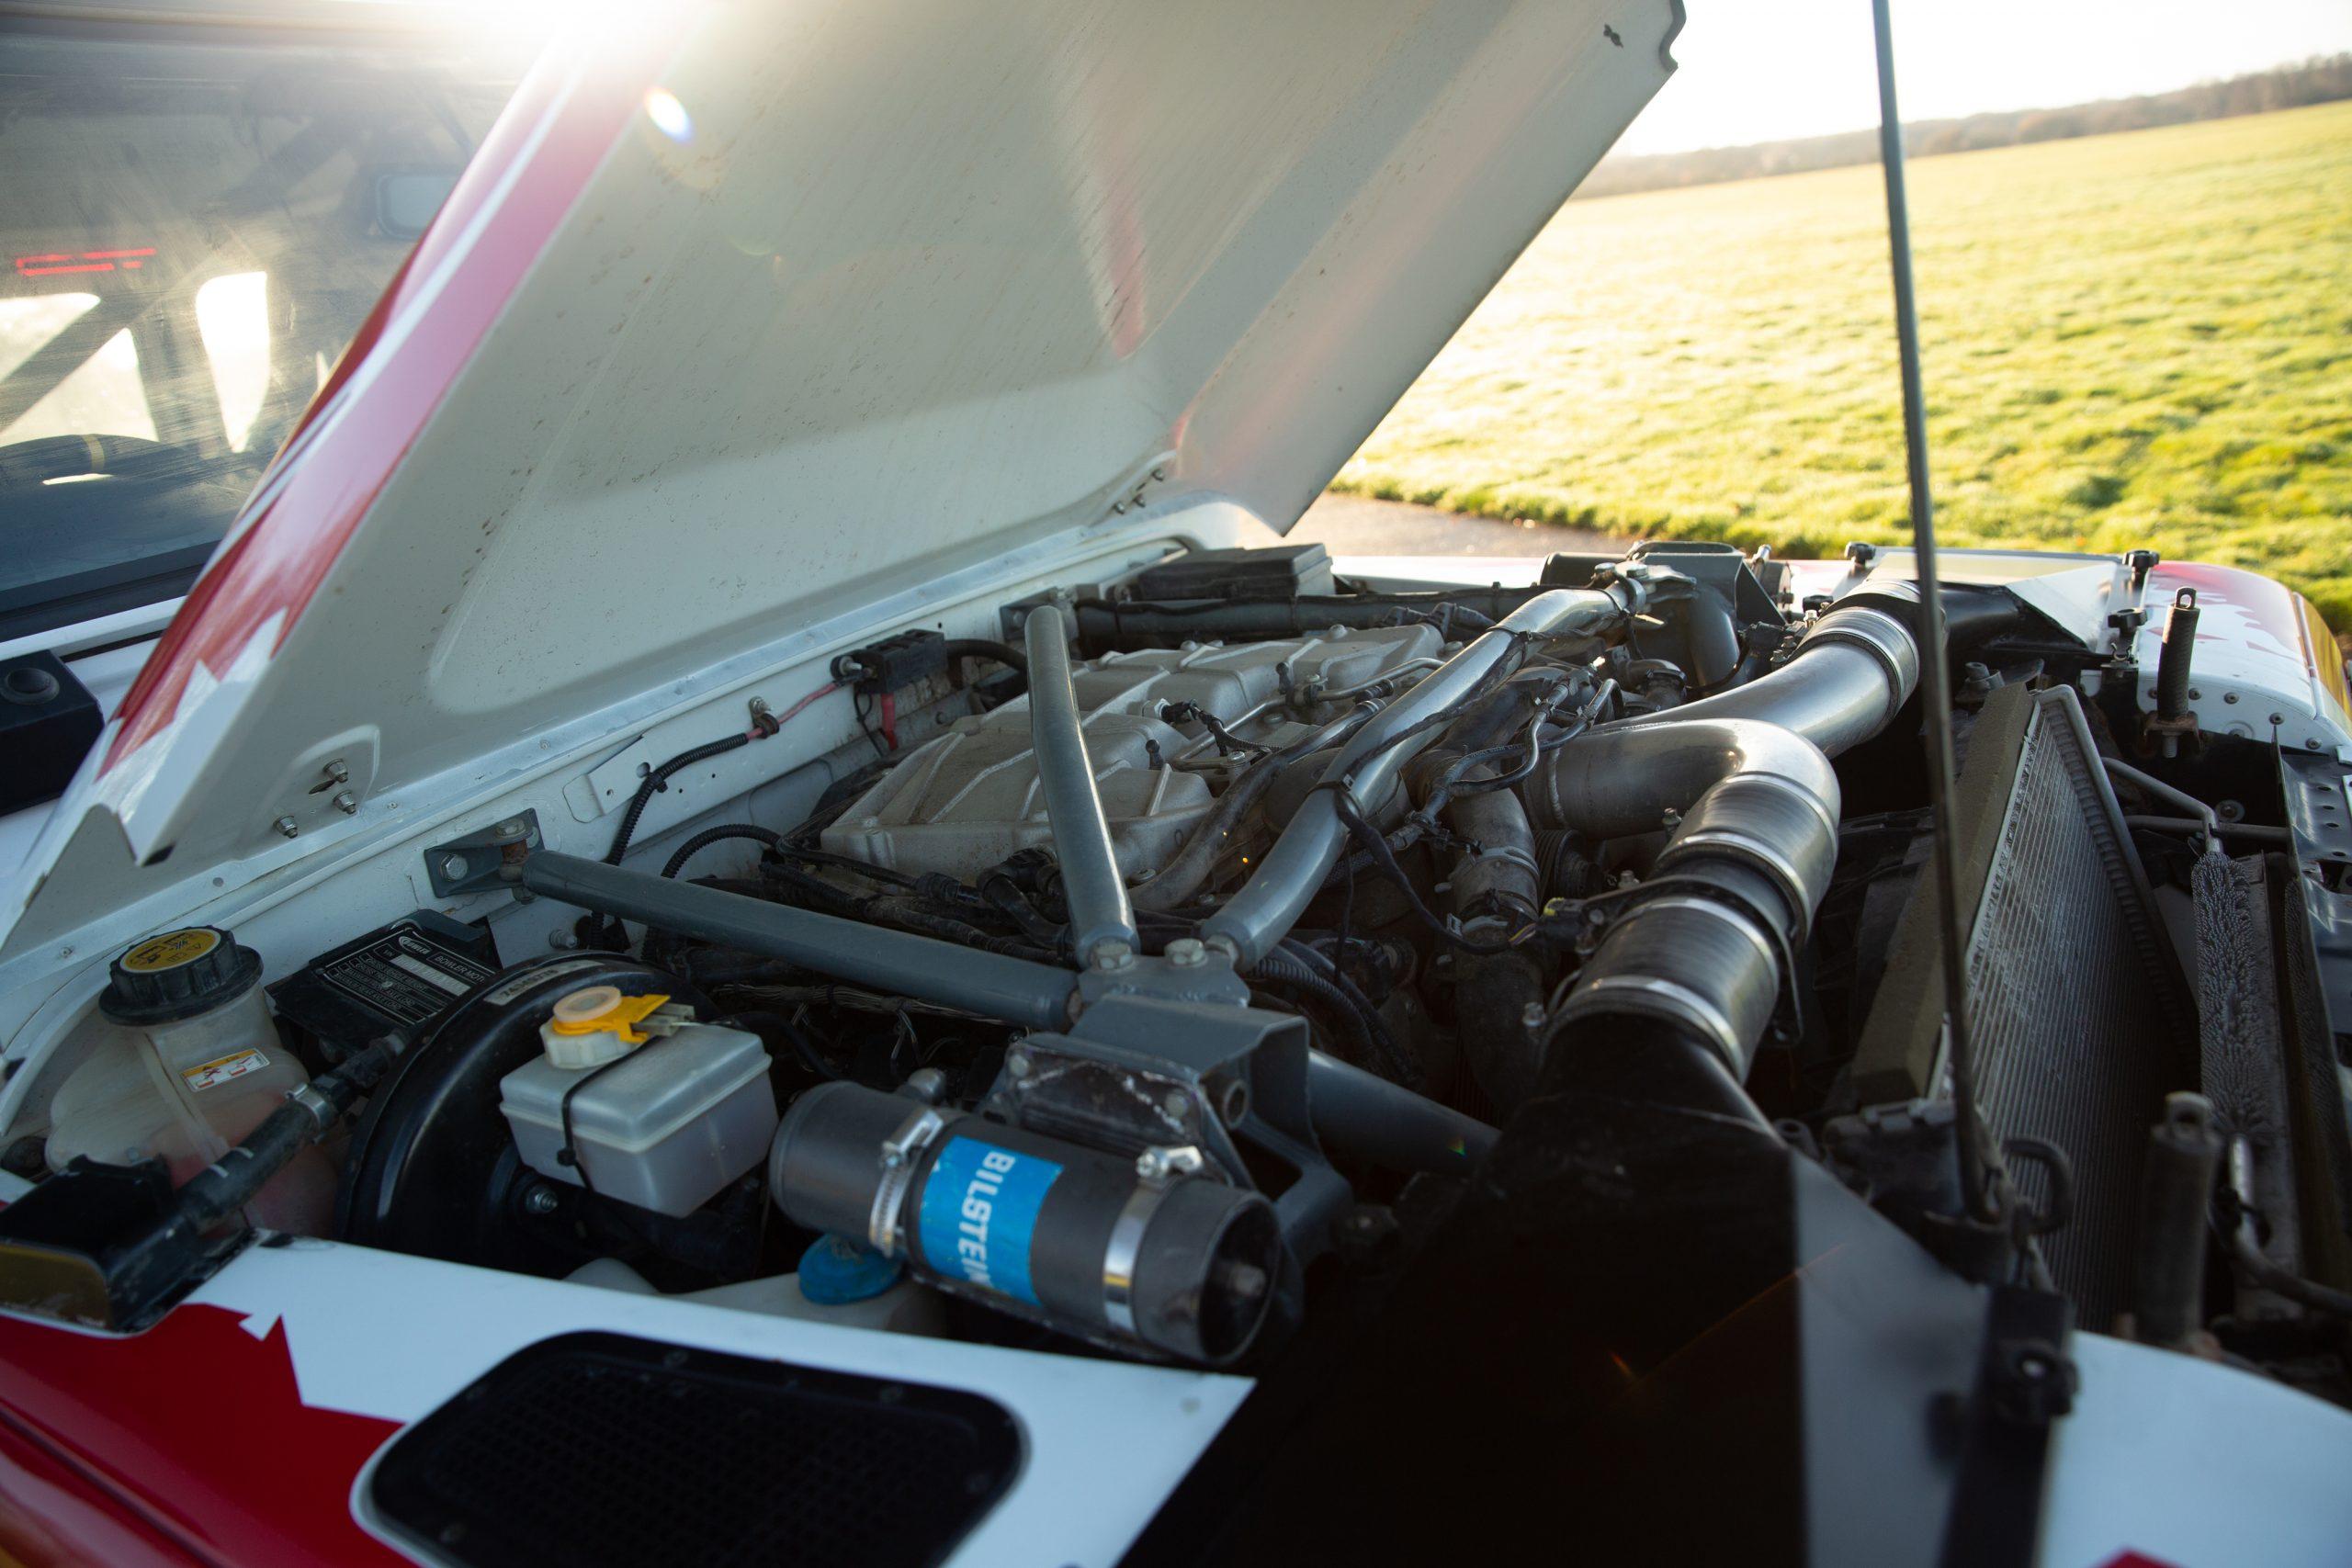 Bowler Pennine V6 110 Prototype engine